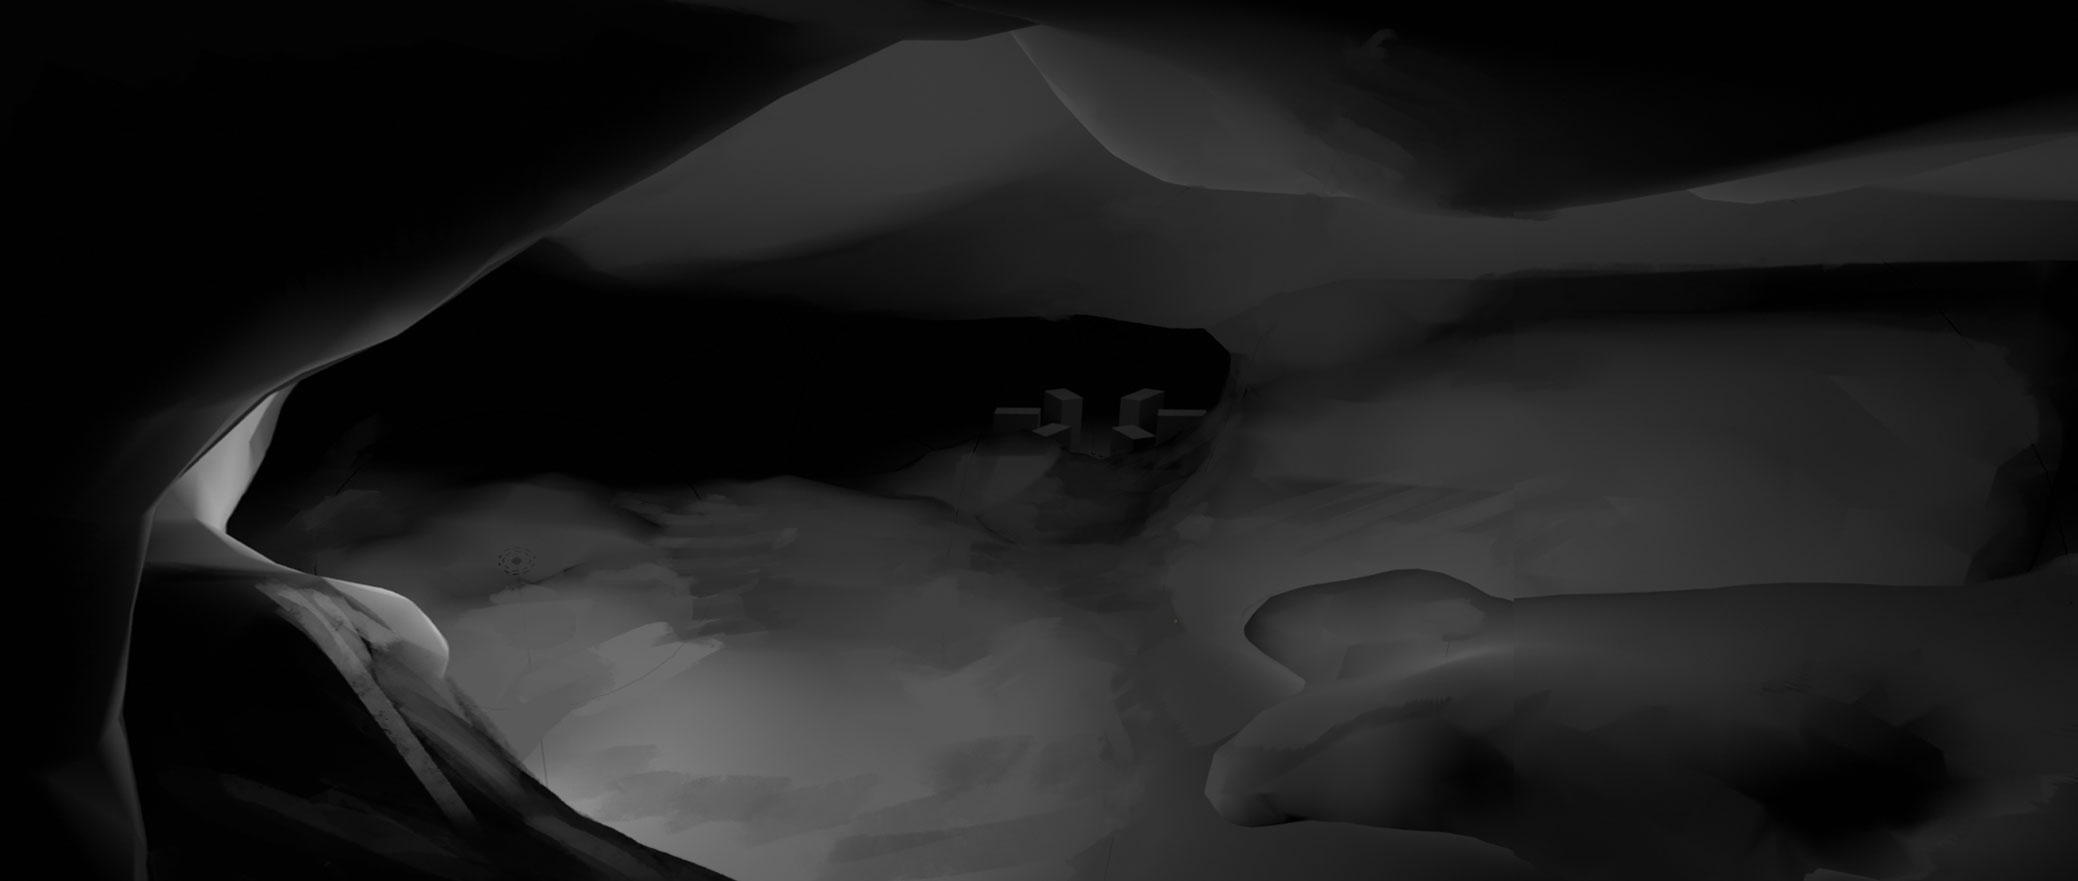 Wraiths_2019Animatic_Thumbsheet-02_74.jpg